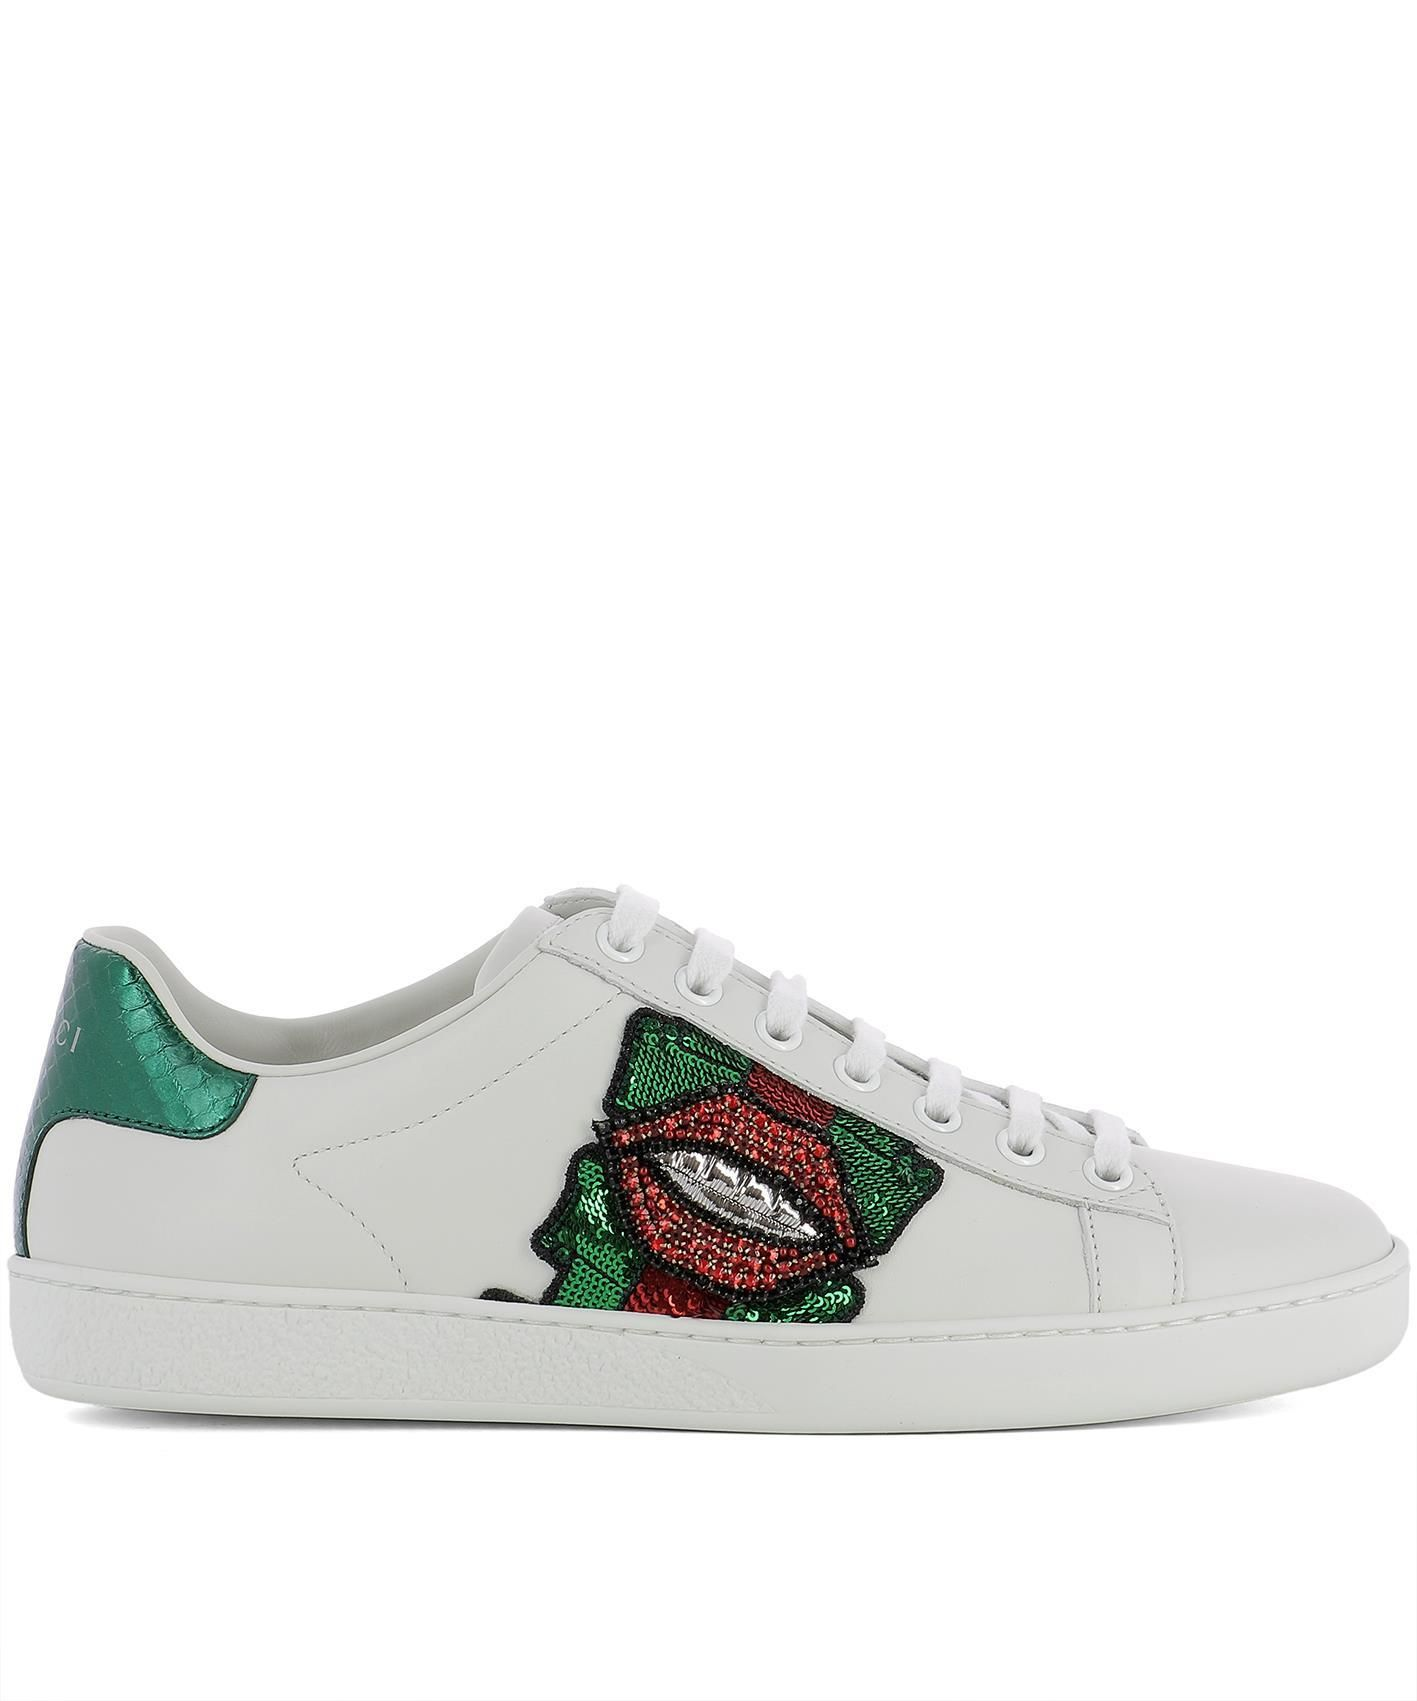 c440f4985 GUCCI GUCCI LIPS SEQUIN SNEAKERS. #gucci #shoes | Gucci in 2019 ...